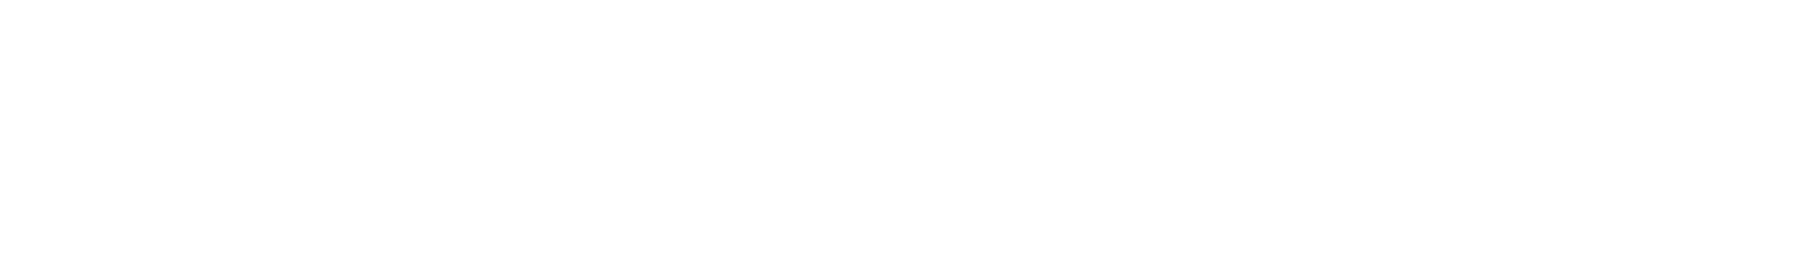 custom music2 keren shteimberg